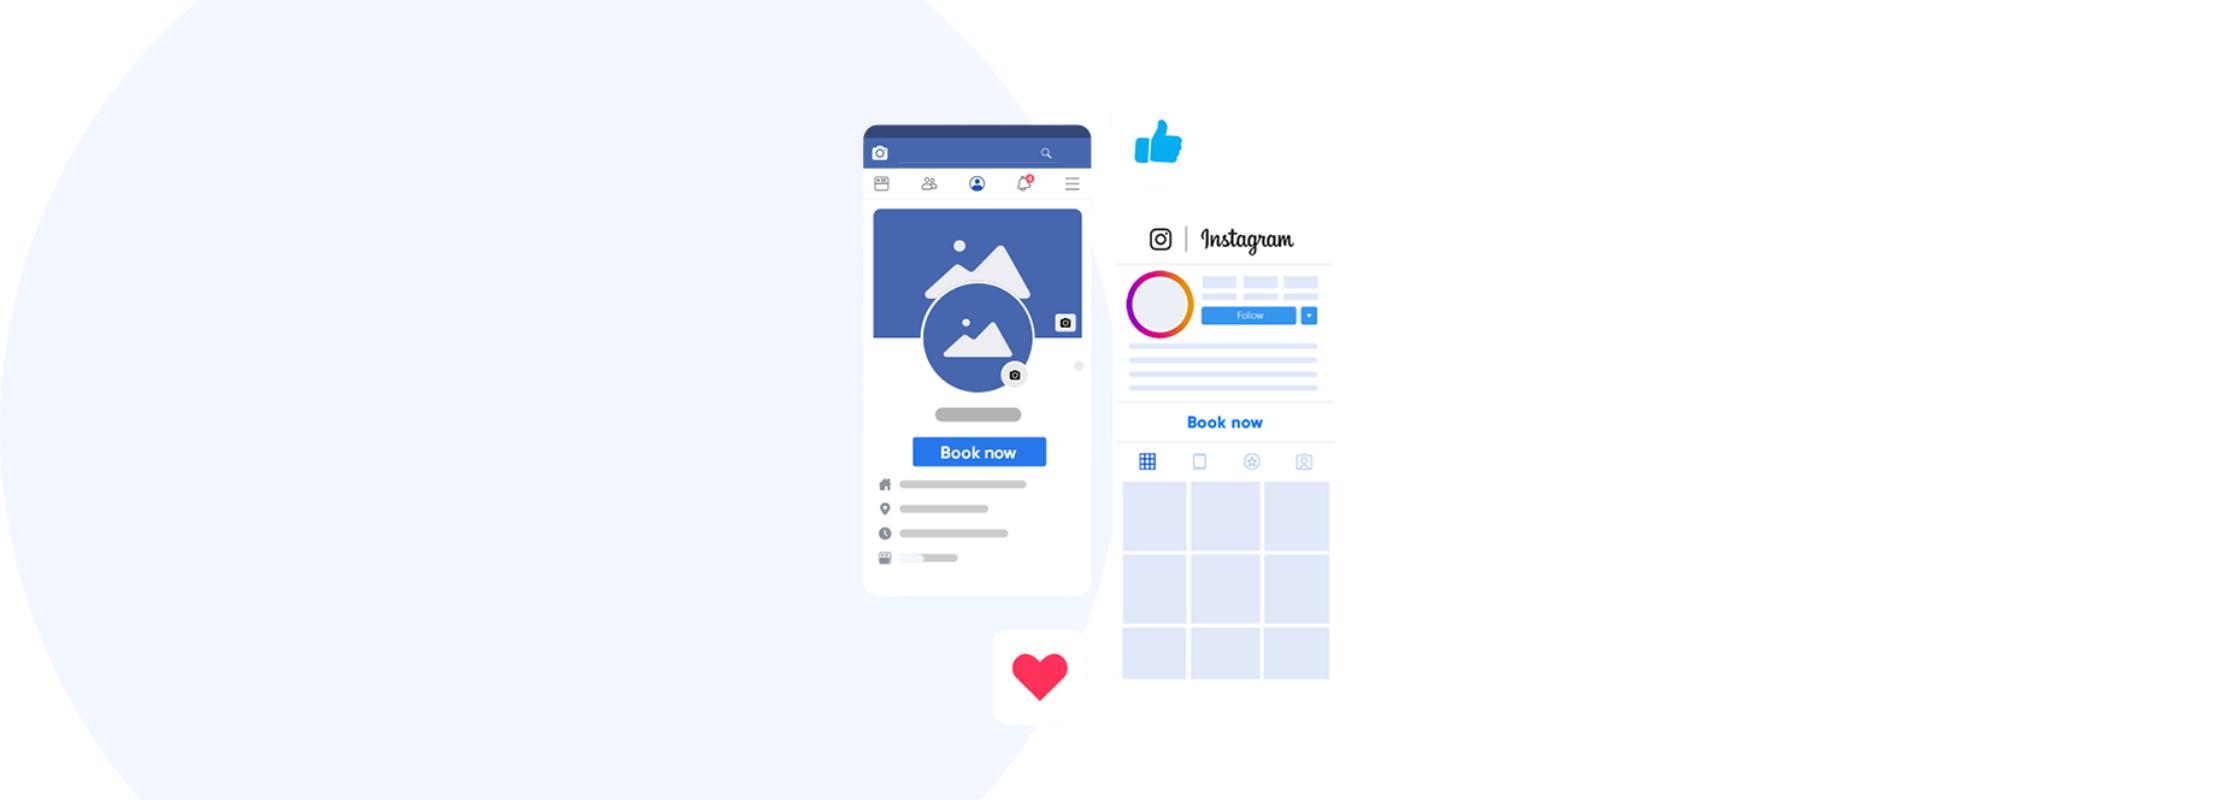 Facebook and Instagram integration